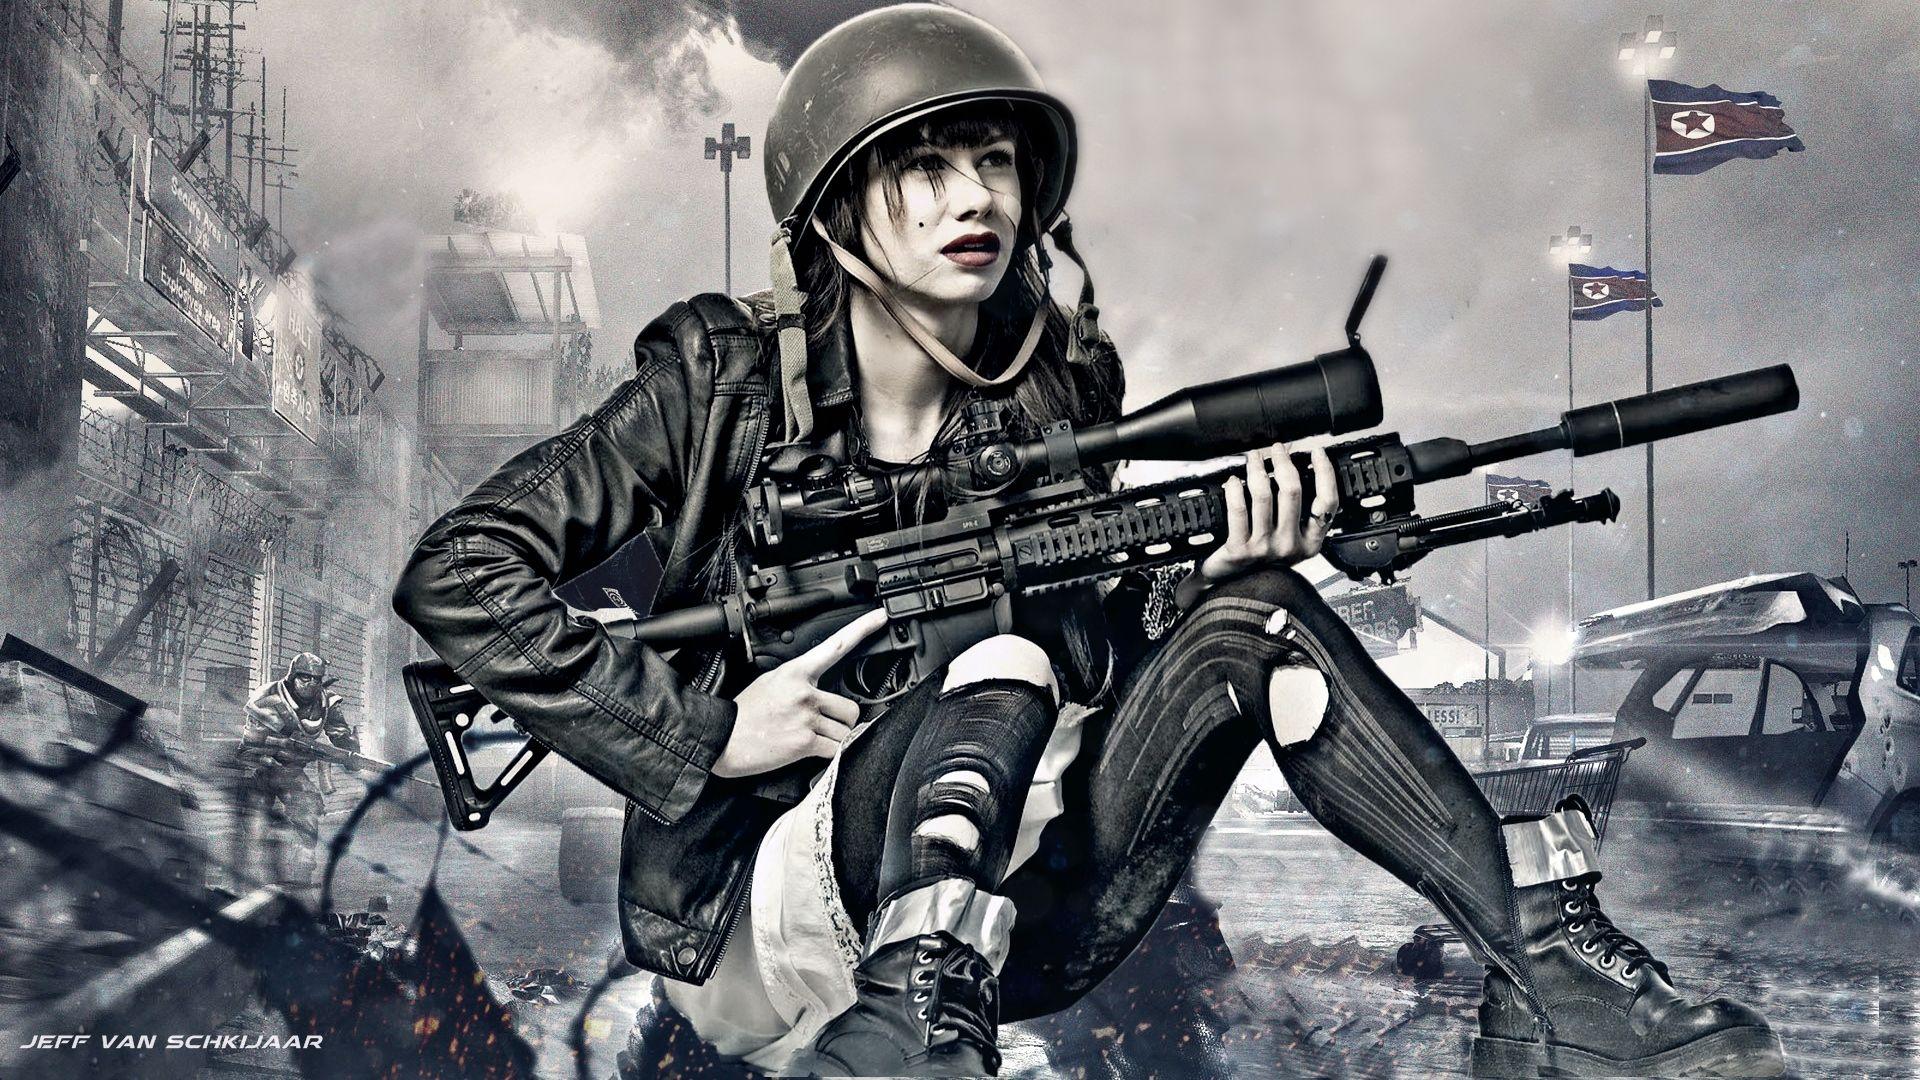 Soldiers In War Wallpaper - Bing Images